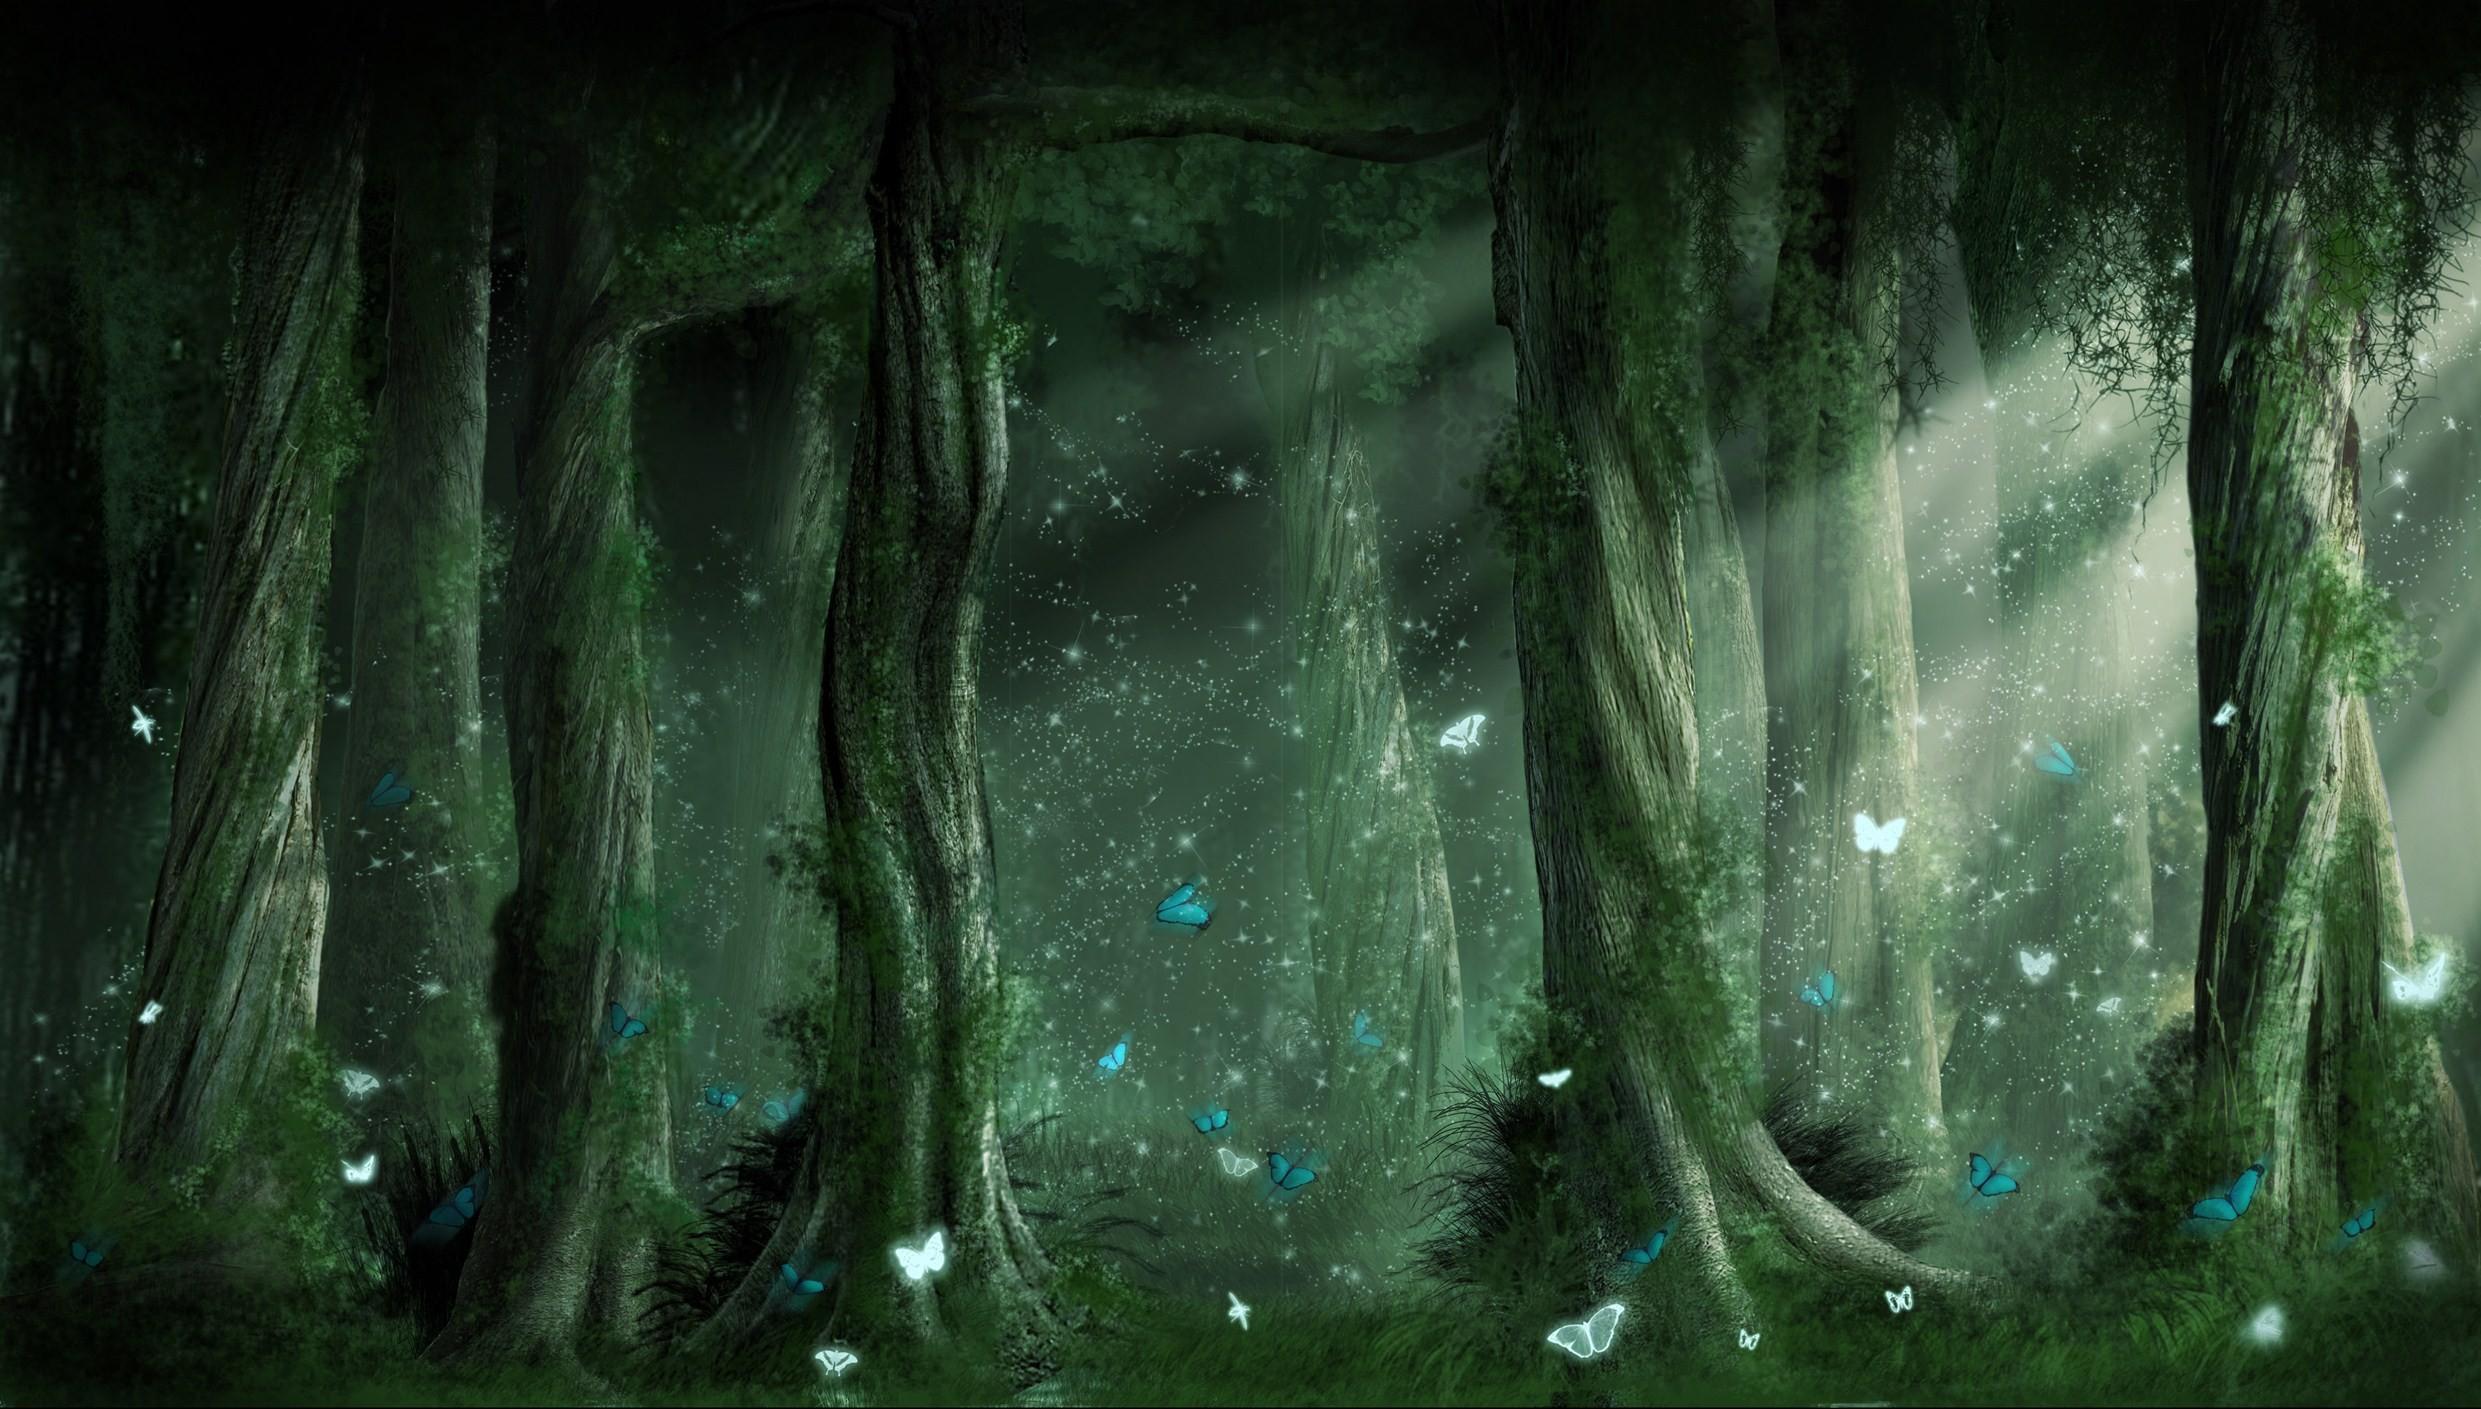 fantasy forest wallpaper hd